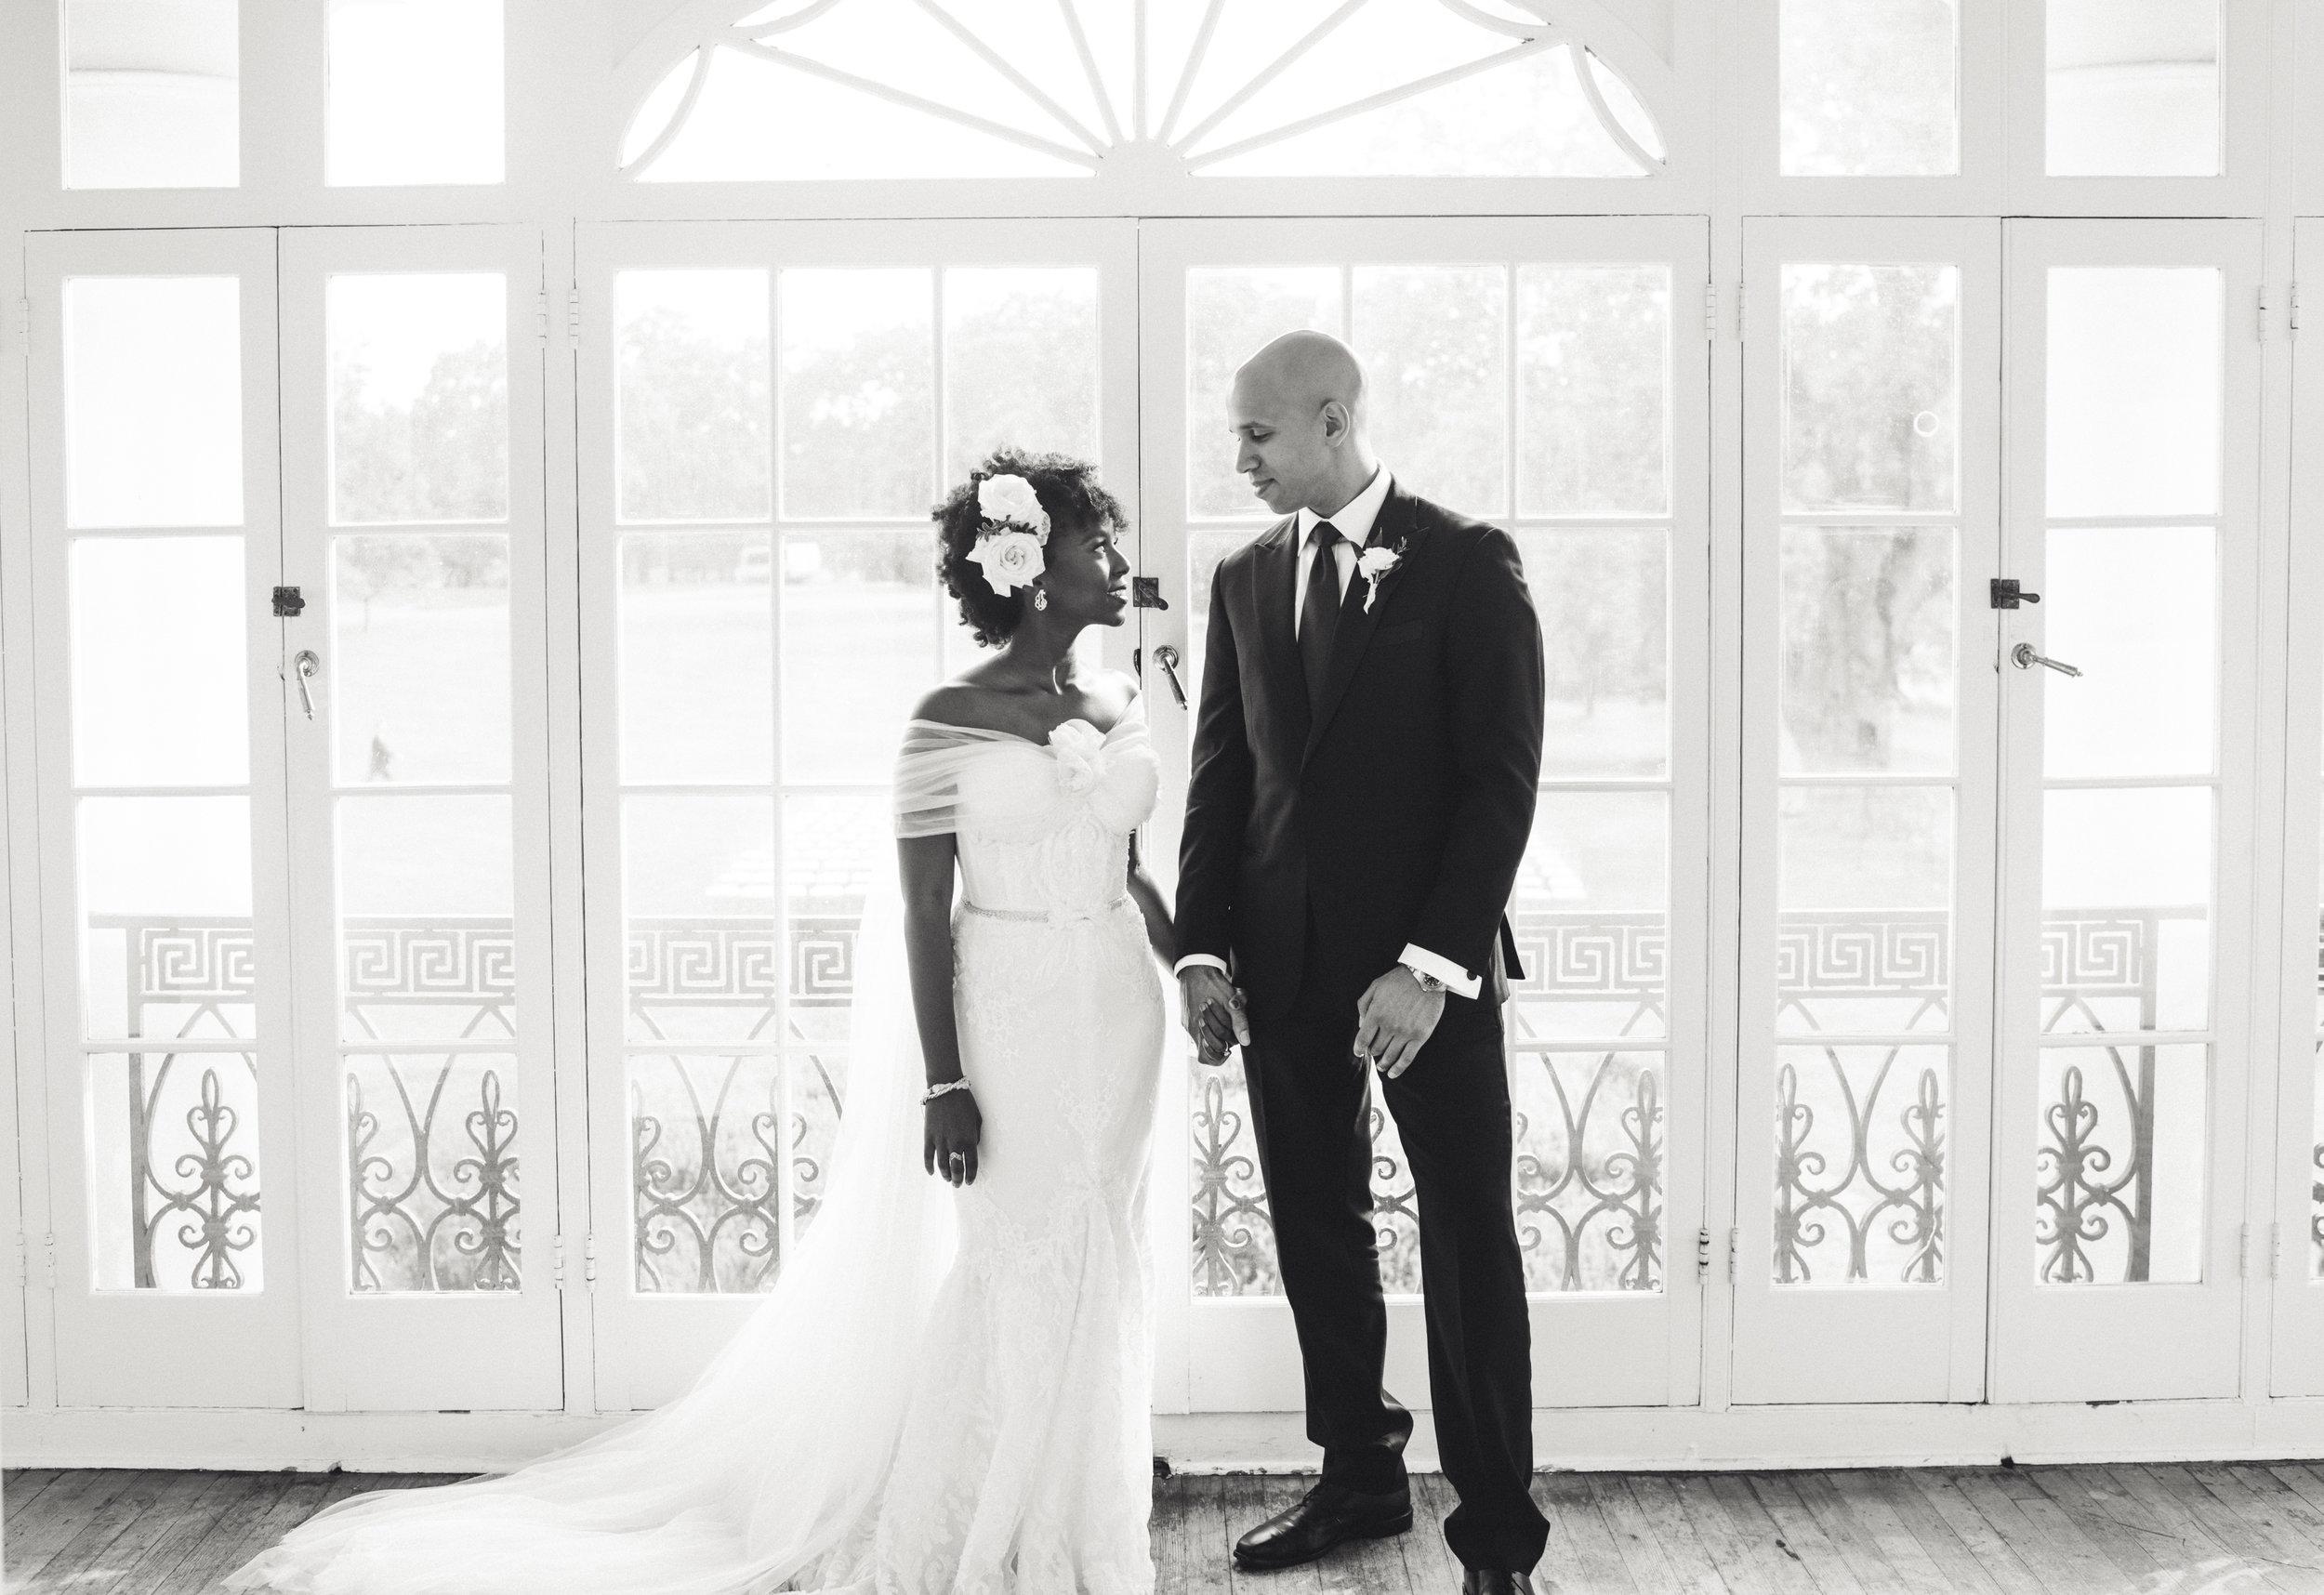 SADATU & KAREEM - GLENVIEW MANSION WEDDING - TWOTWENTY by CHI-CHI AGBIM-295.jpg